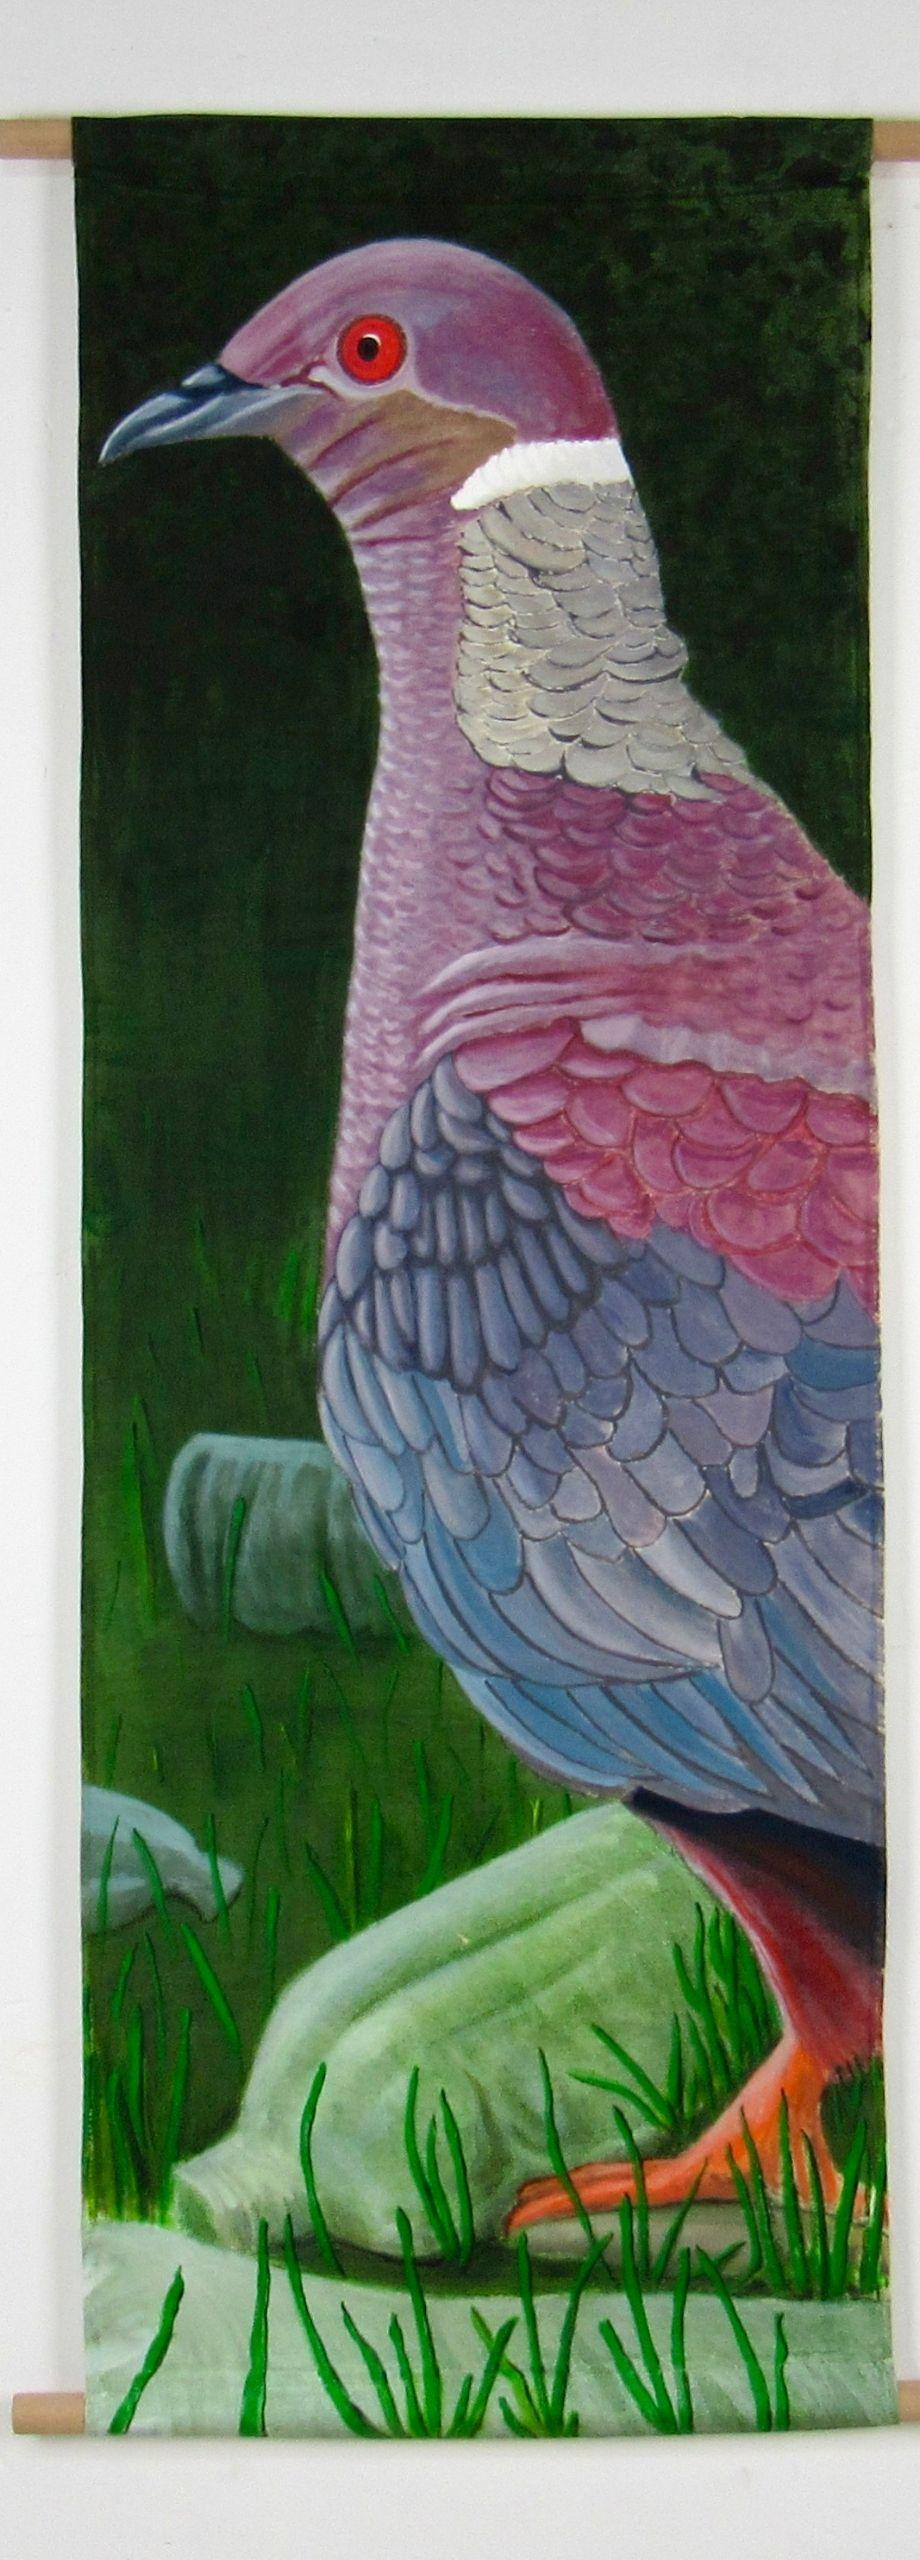 Araucanian pigeon bird (135x45 cm)